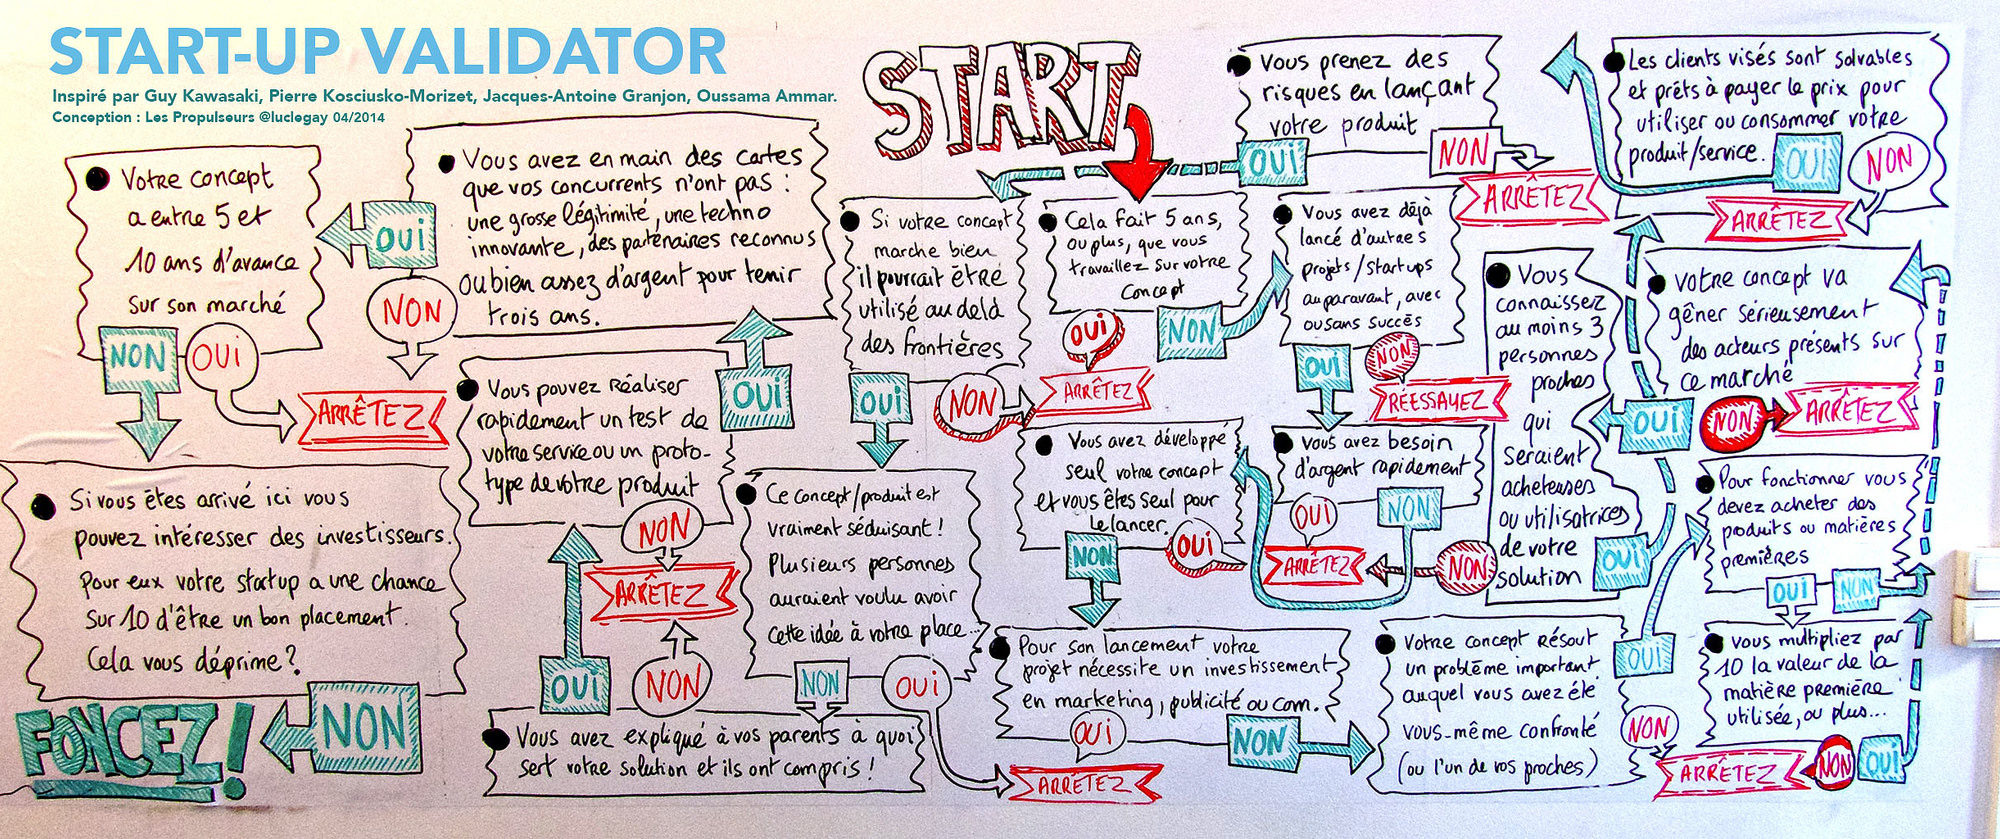 Startup Validator version d'origine murale